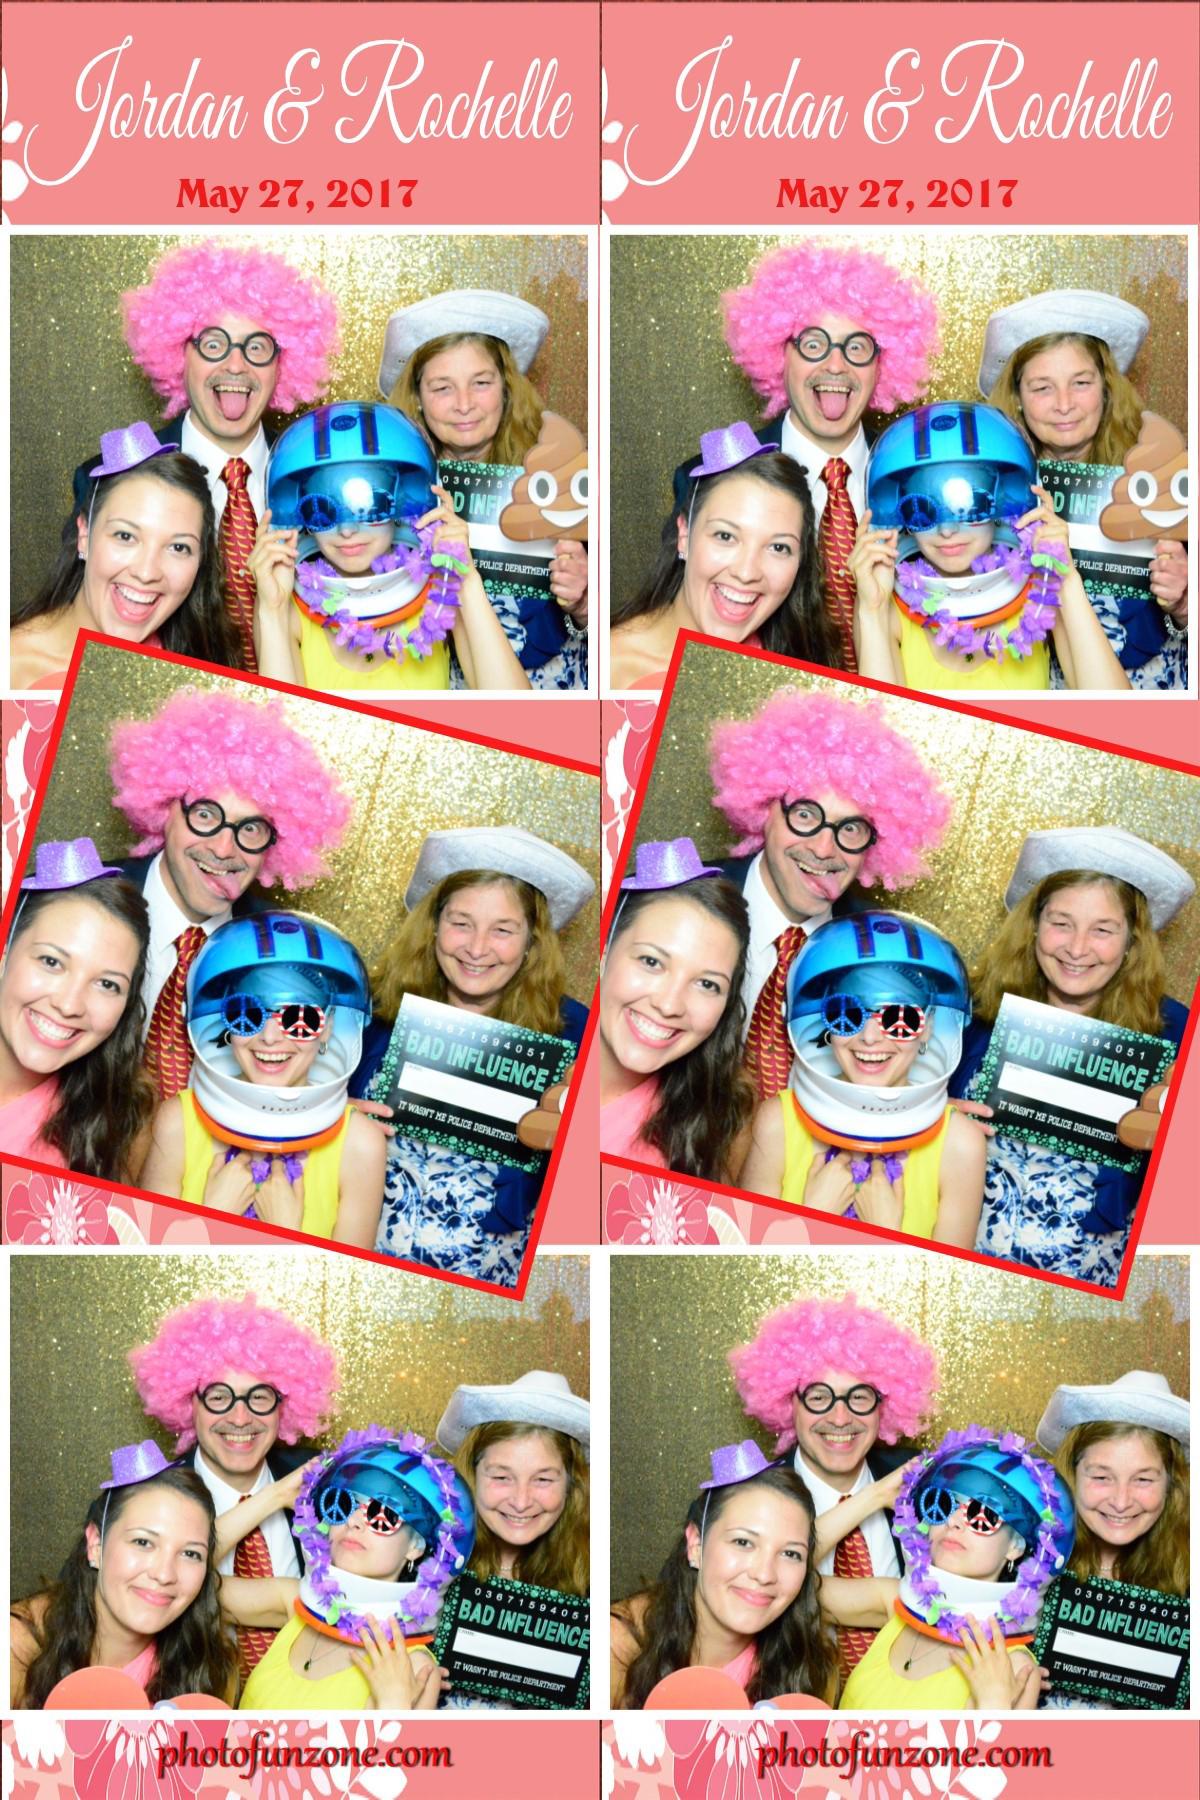 Photo Fun Zone Booth Rentals Weddings Birthday Parties Corporate Events Washington DC Virginia